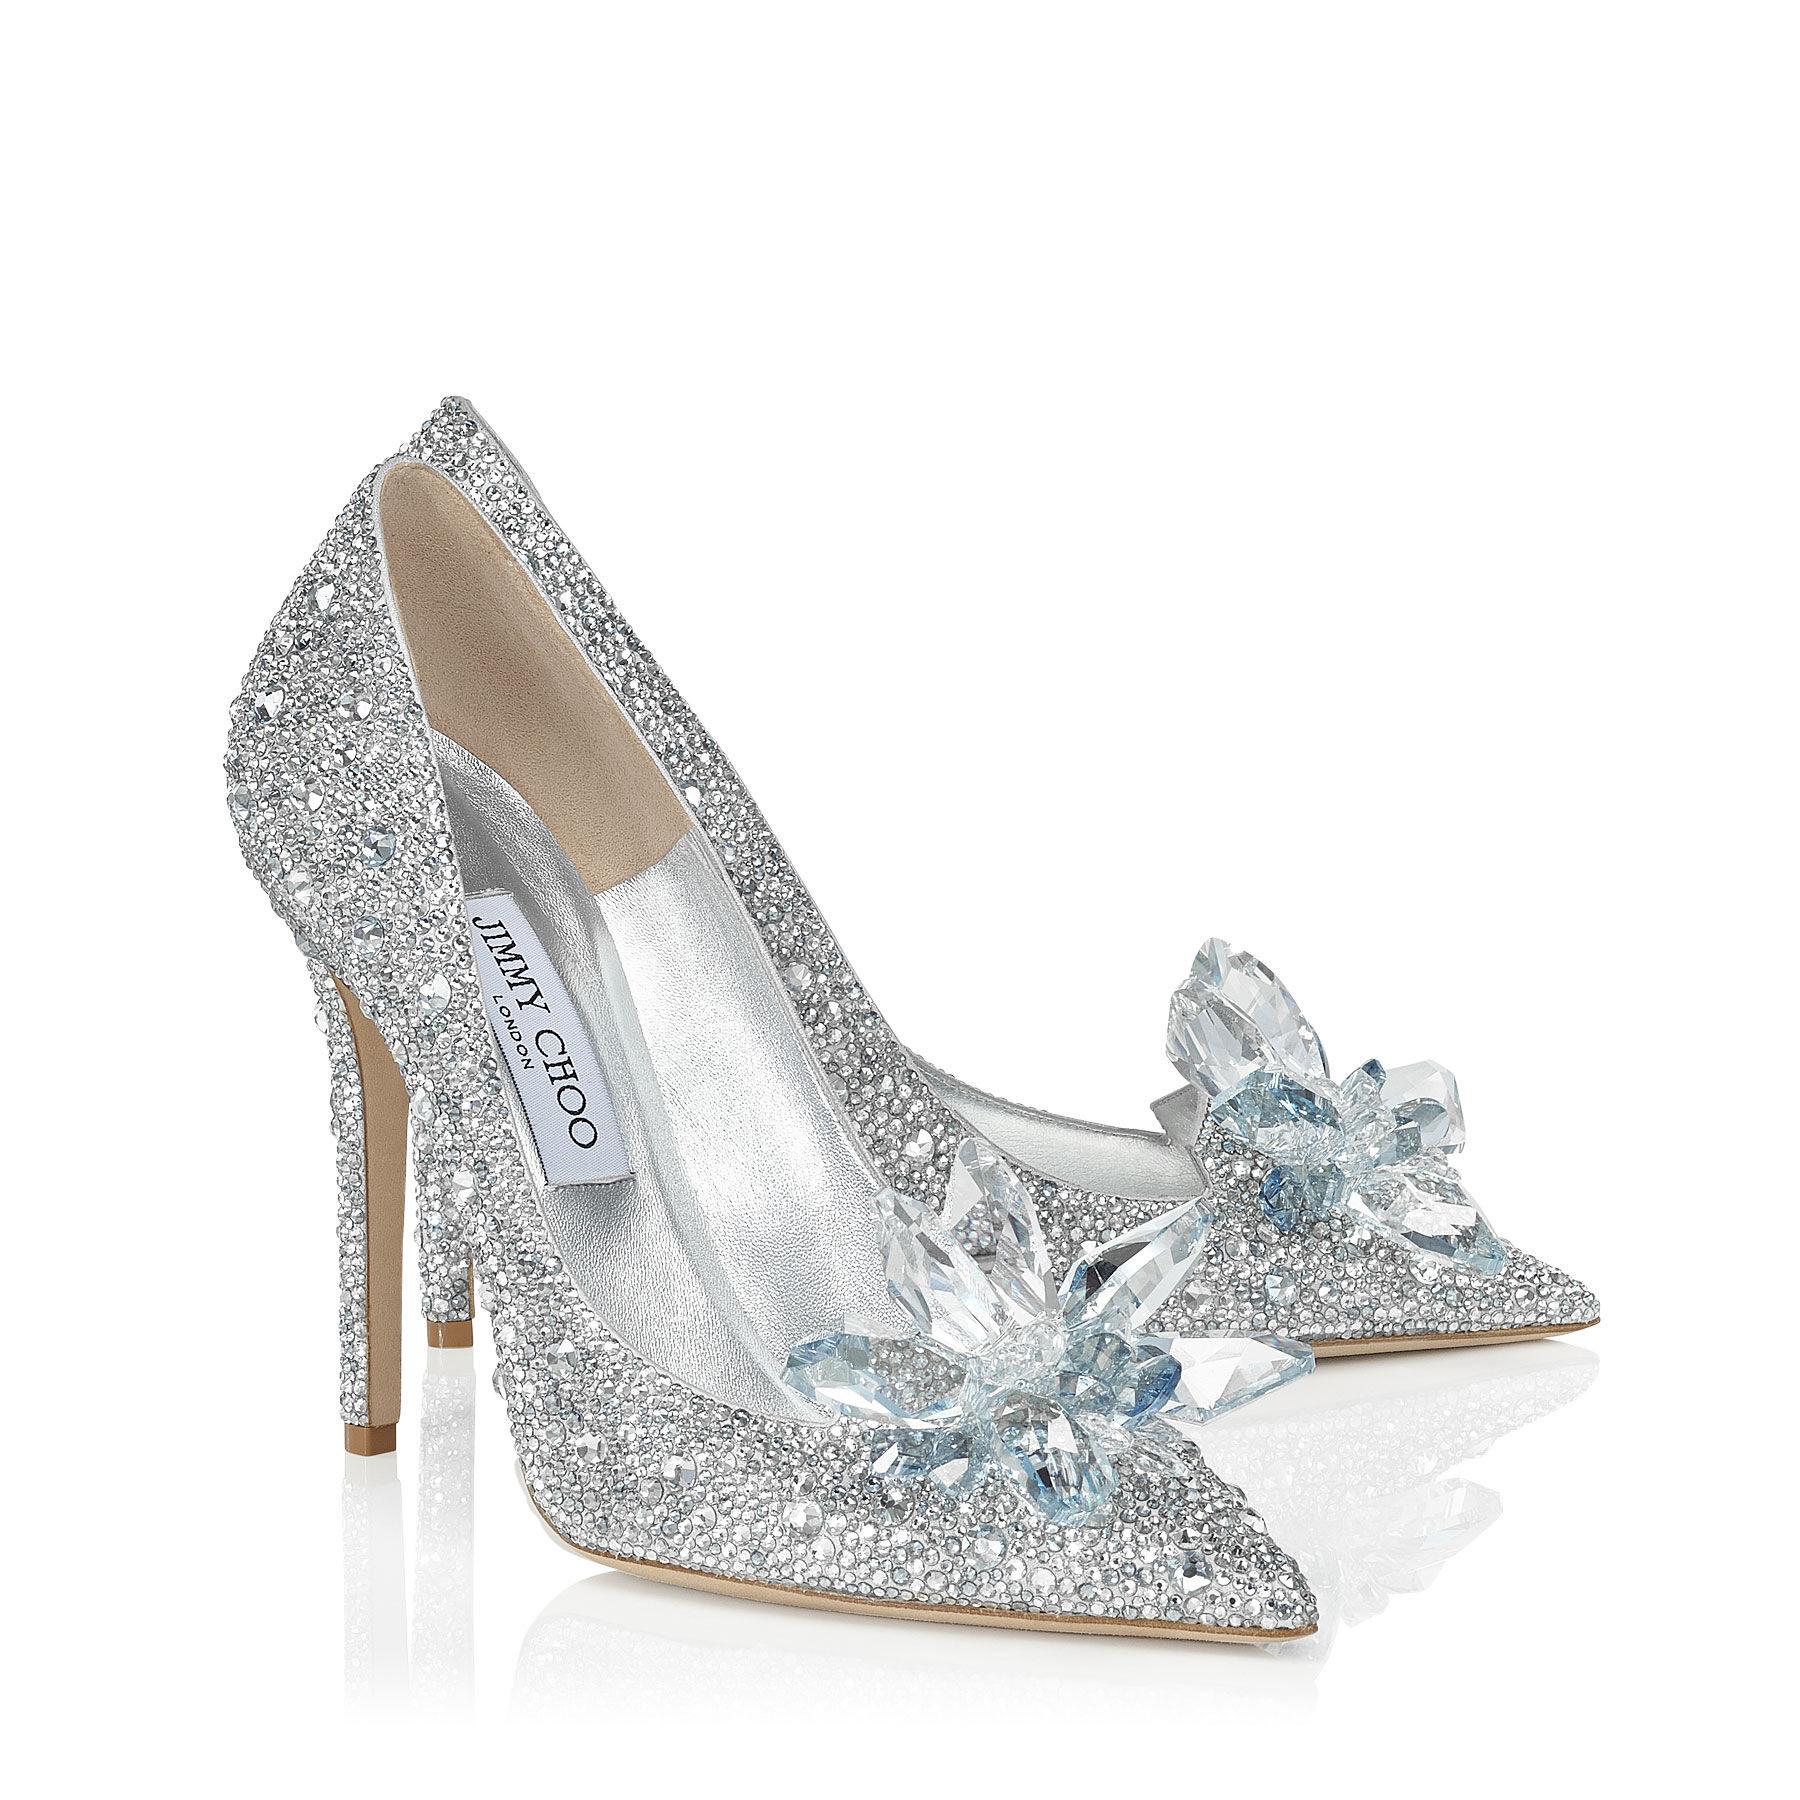 Silver Heels With Crystals